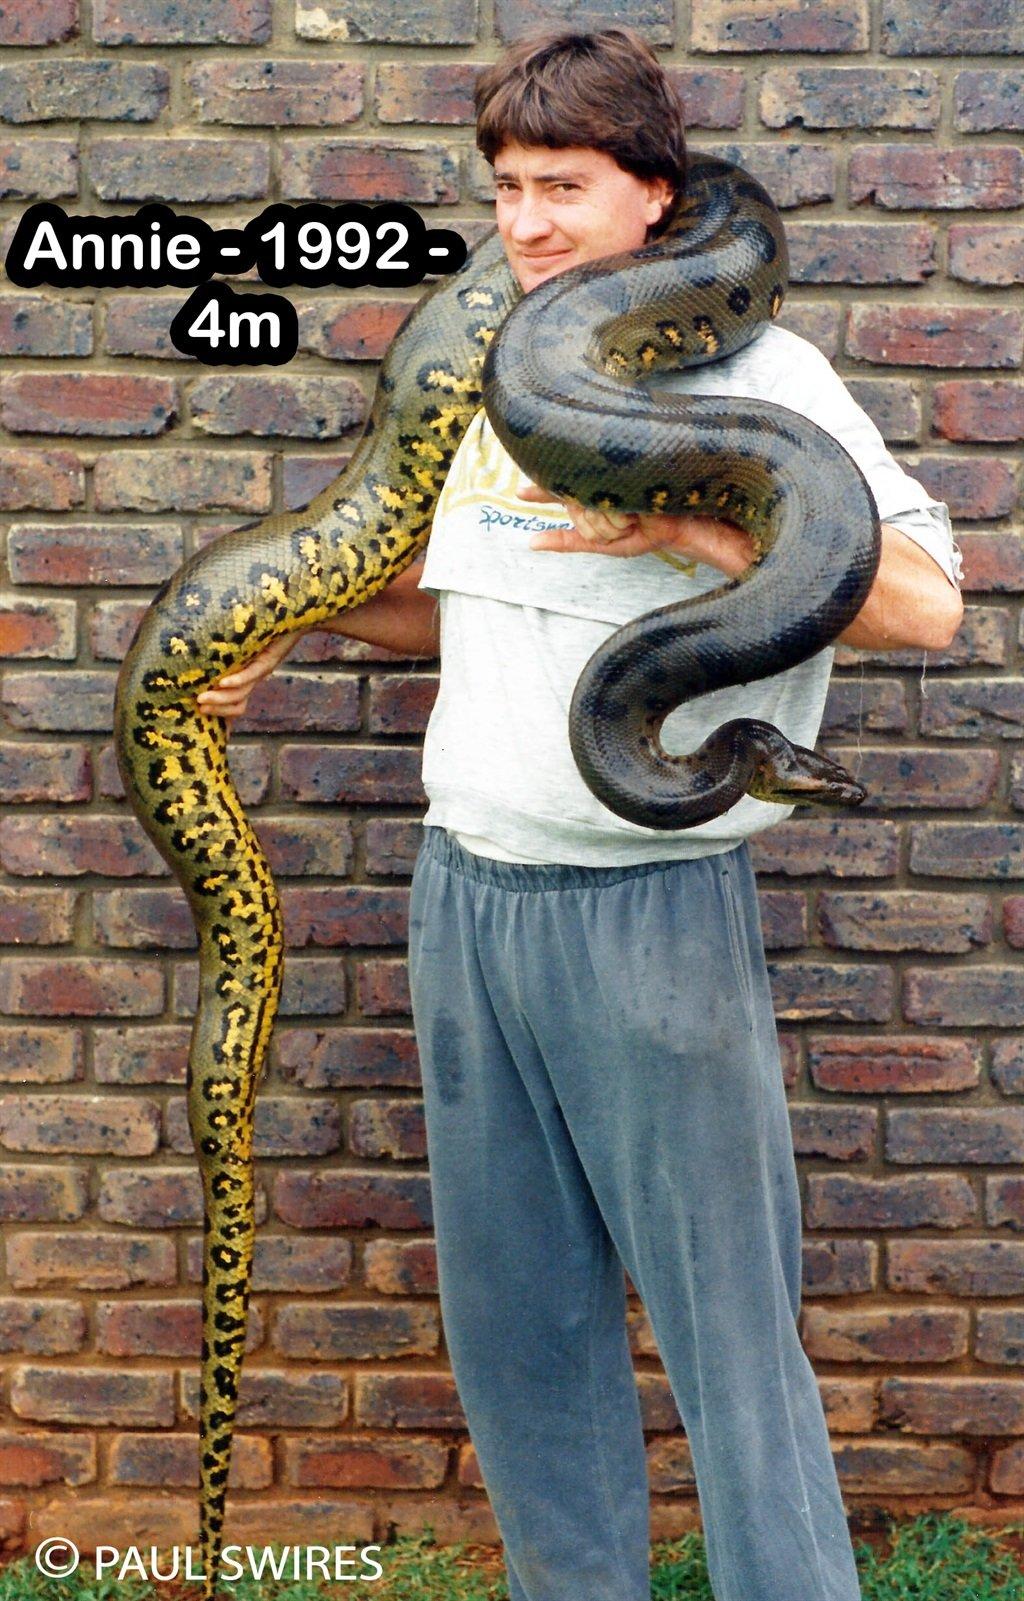 Annie the anaconda weighs over 40kg